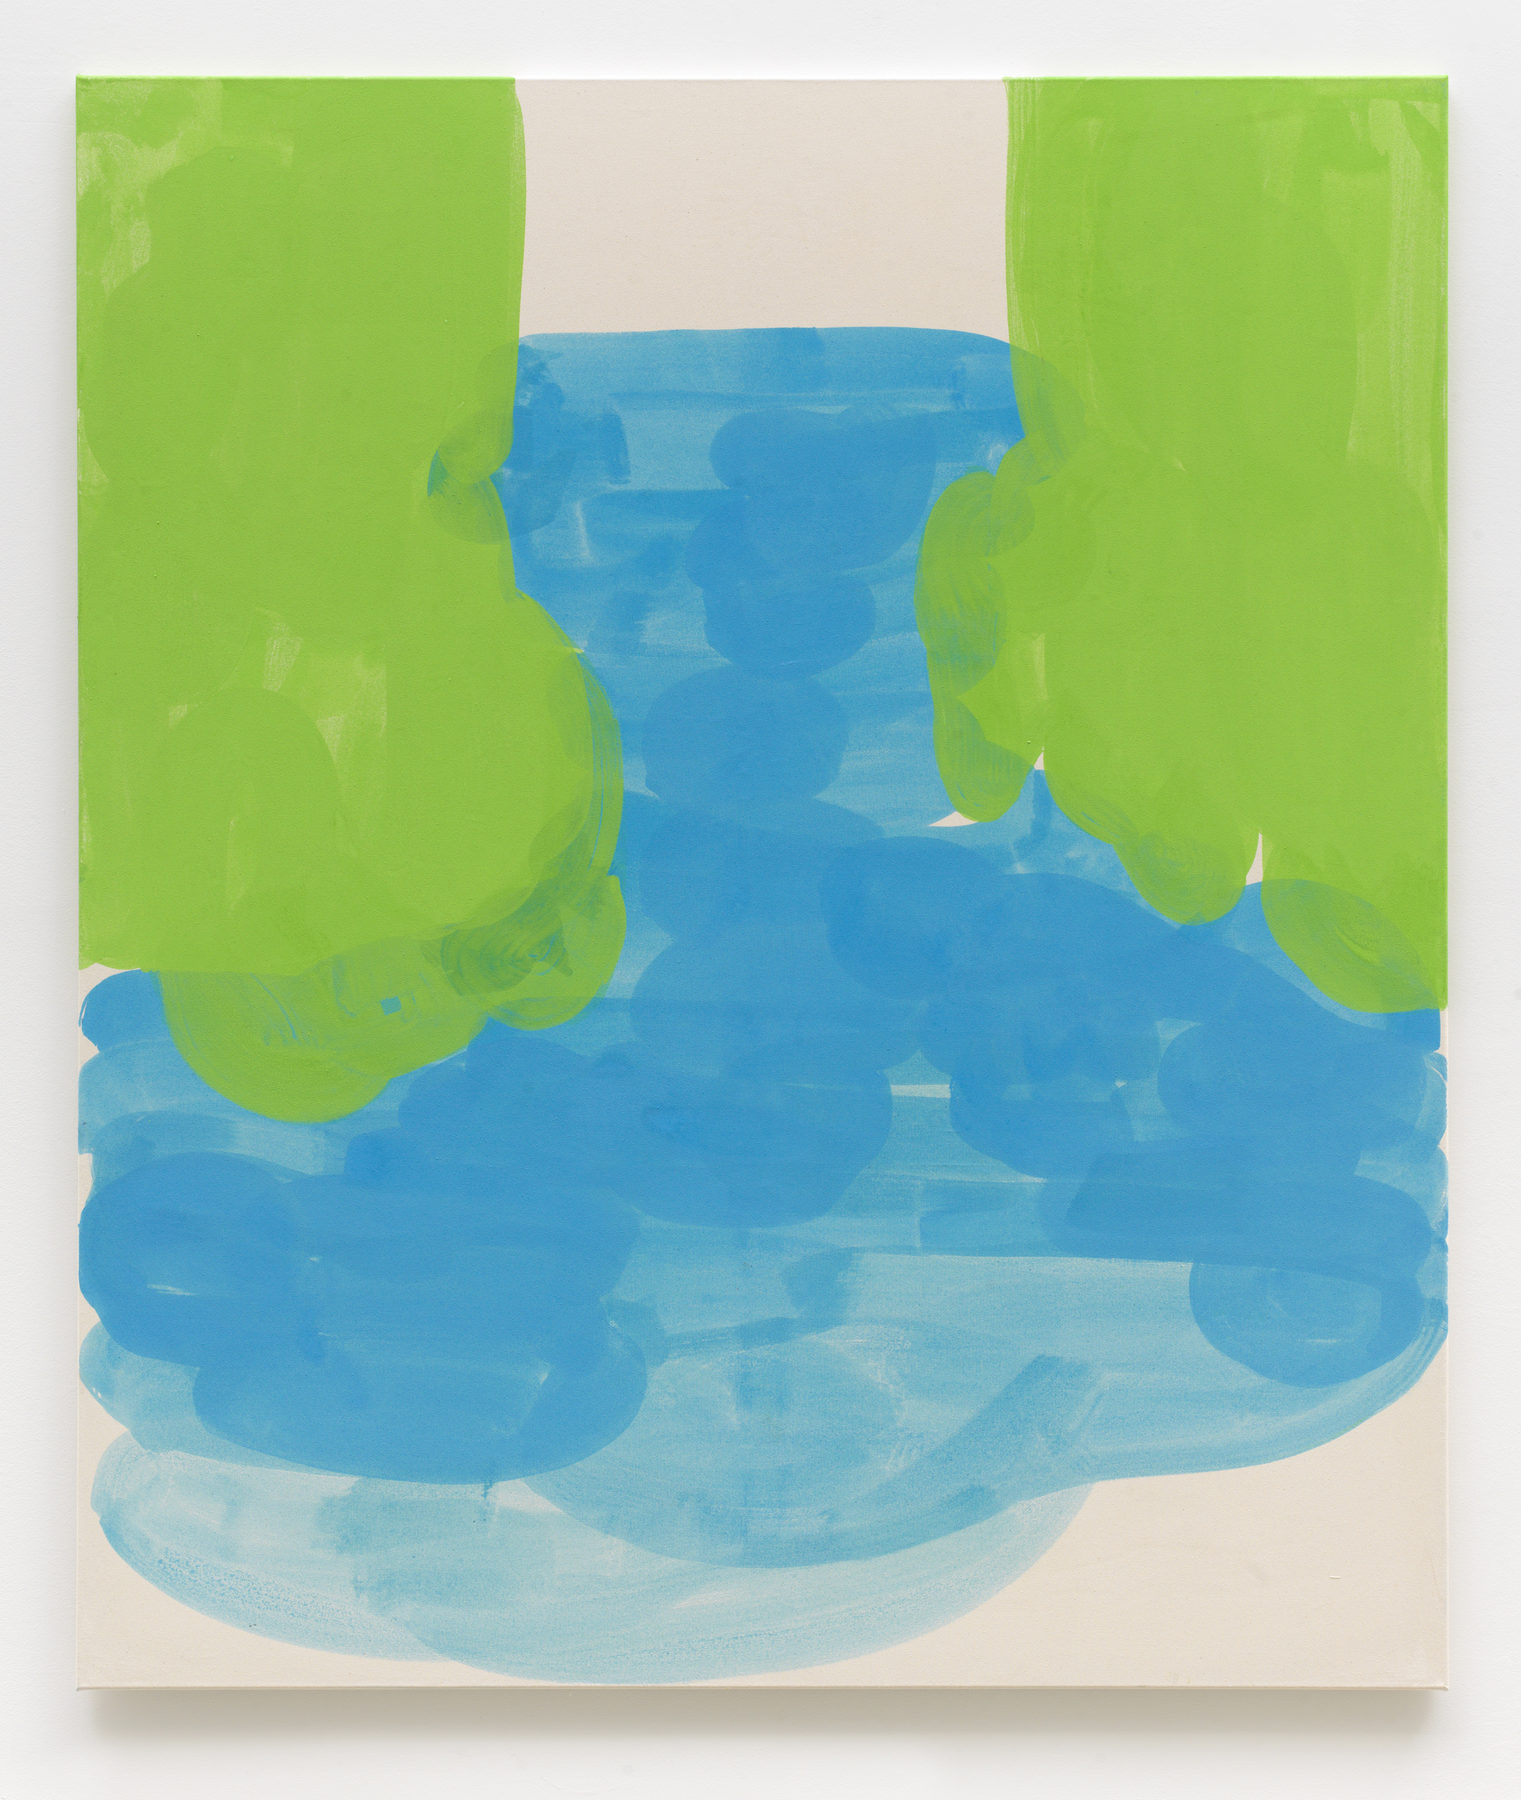 Amadyar_2016_present perfect_Galerie Guido W. Baudach, Berlin